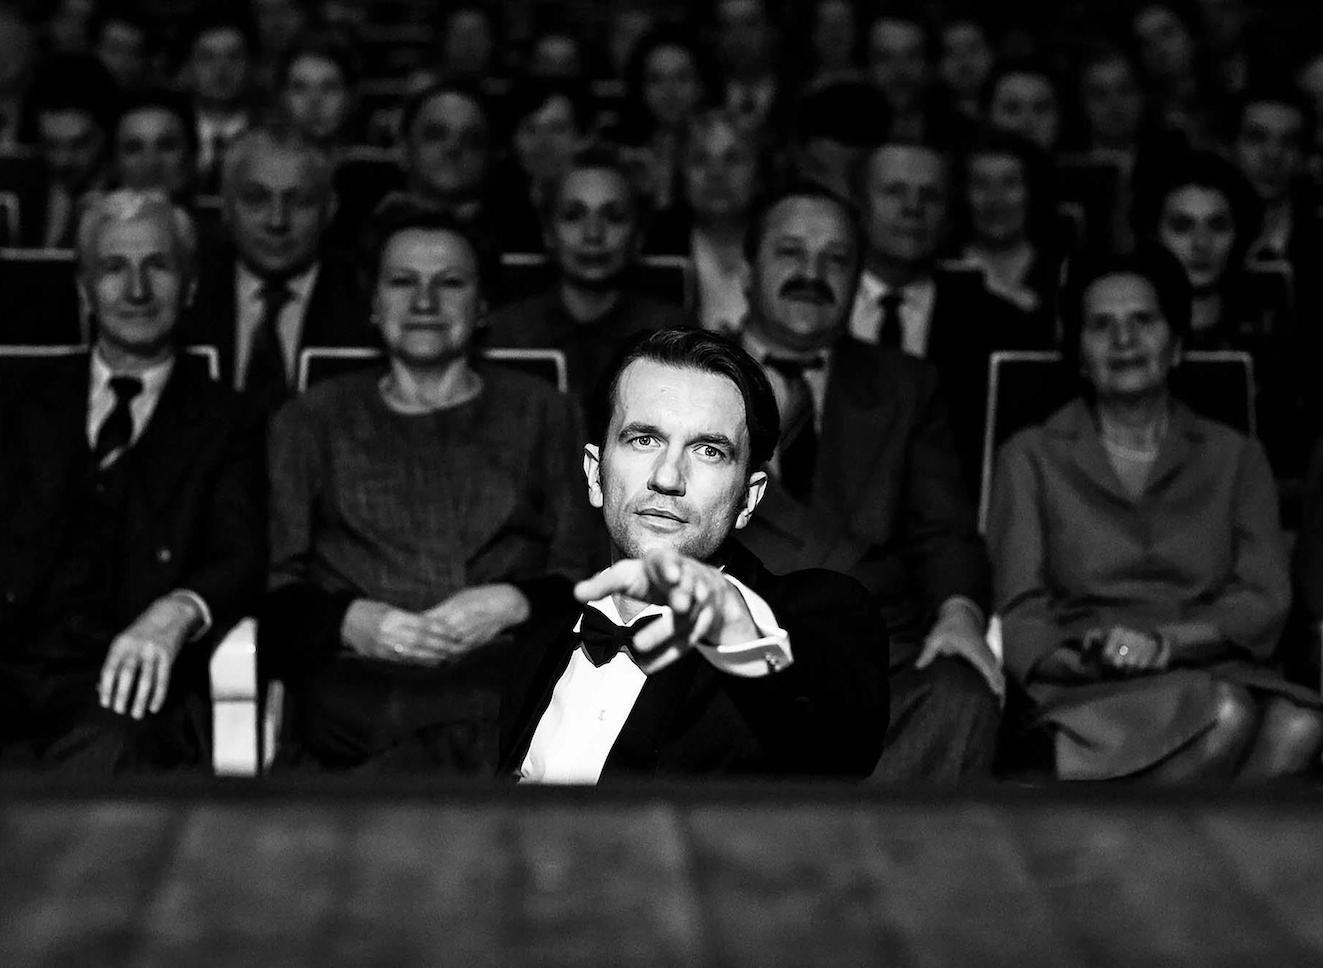 Oscars 2019 Who Should Win